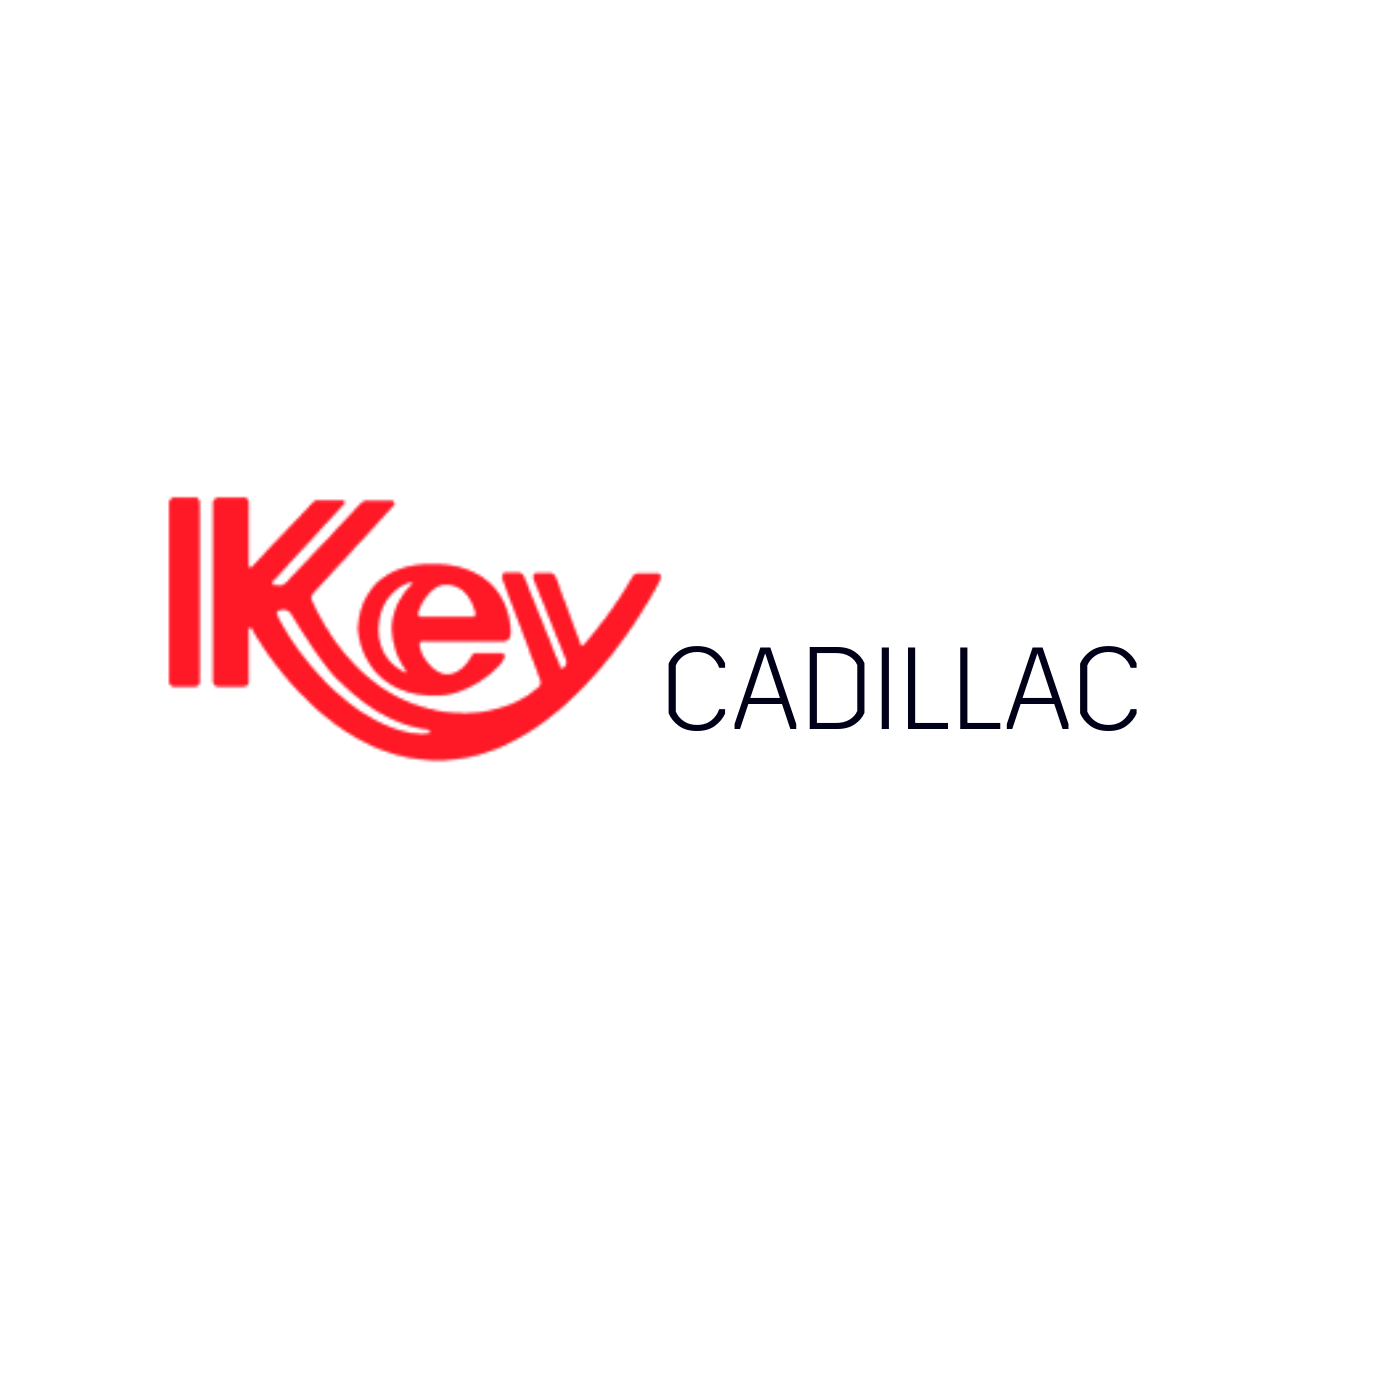 Key Cadillac Logo (square)